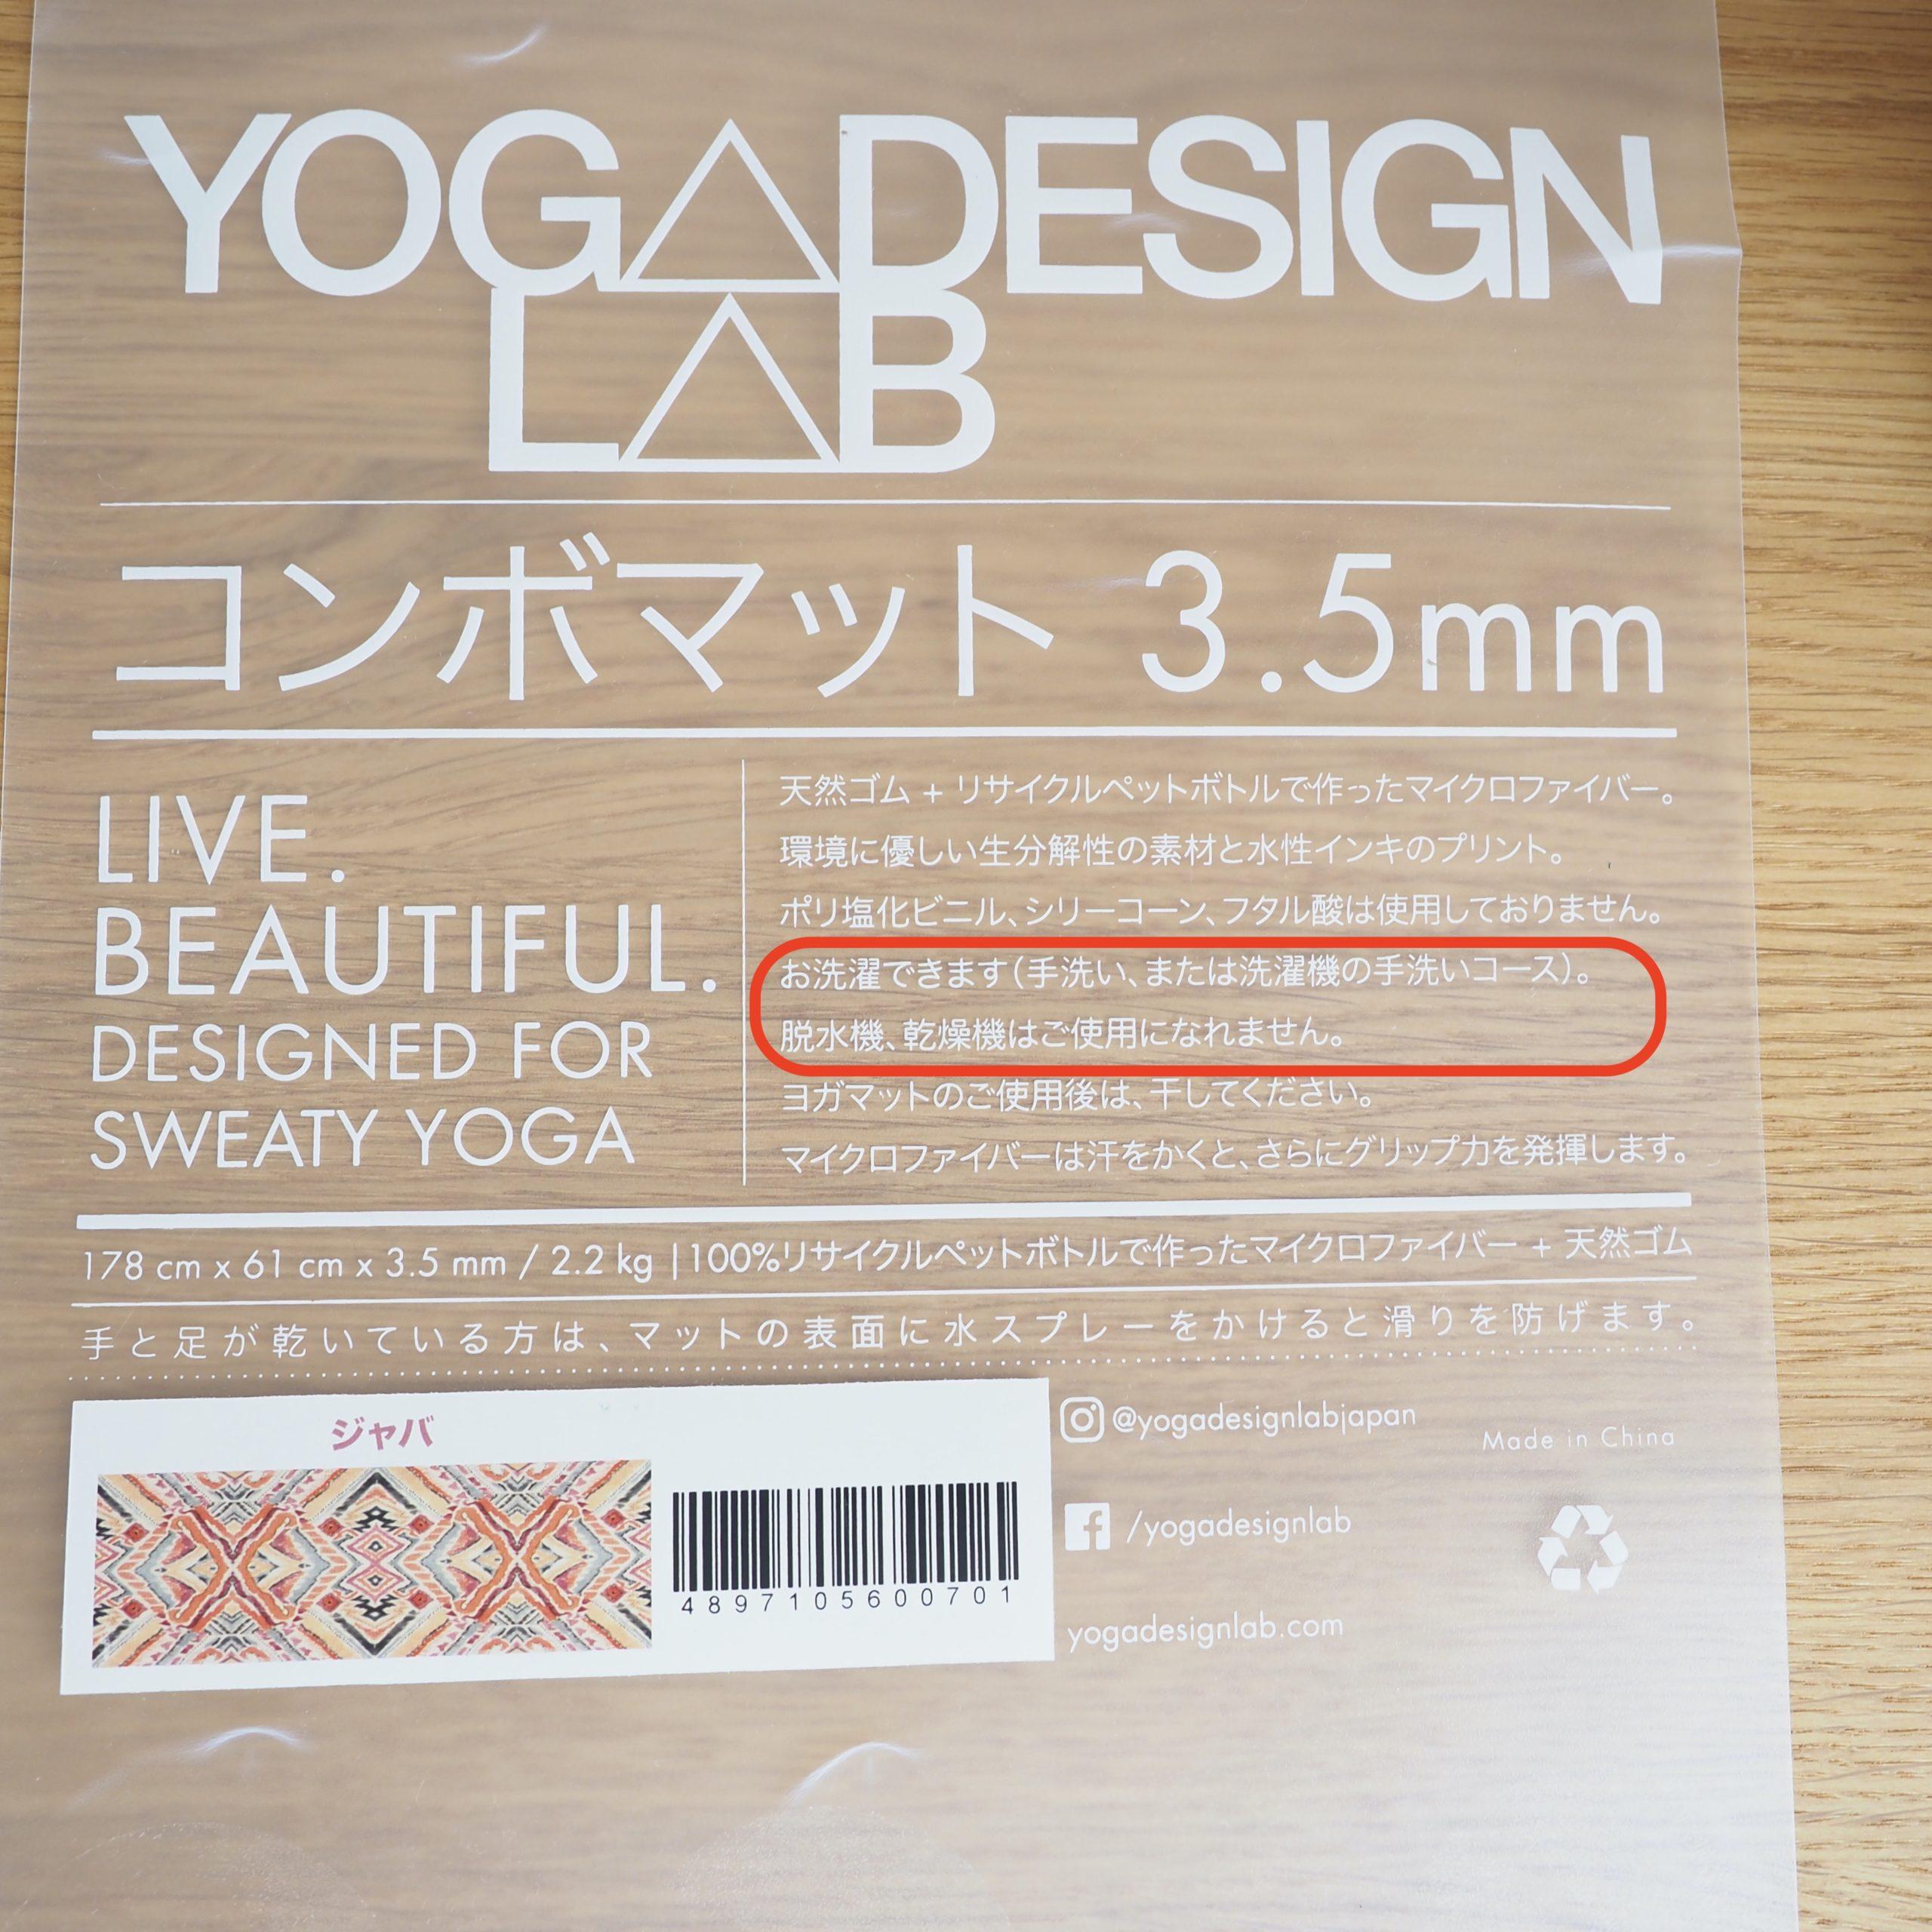 Yoga Design Labのコンボマットの説明書